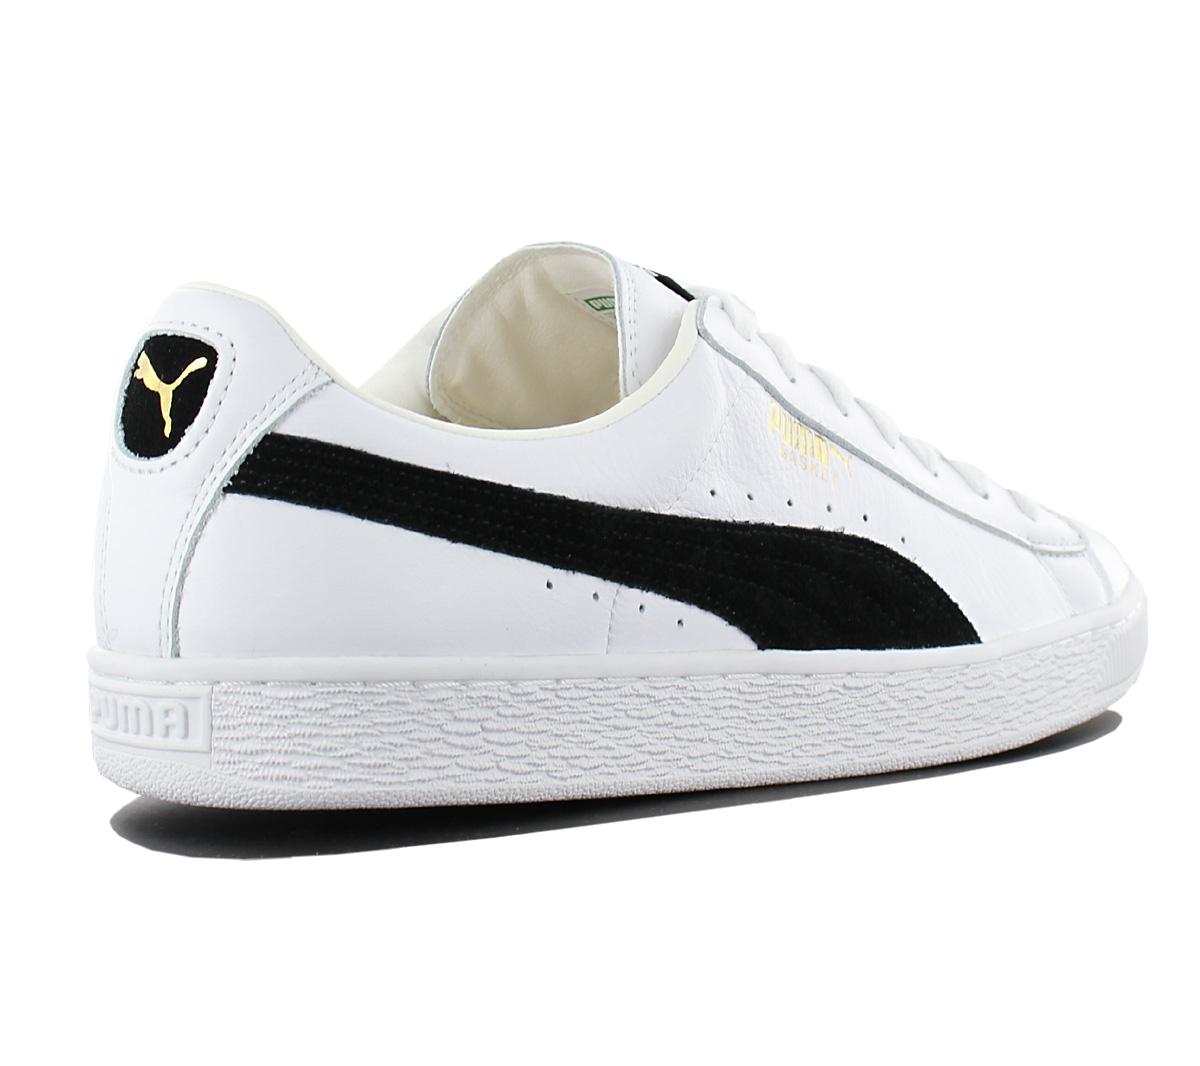 17b3d52999 NEW Puma Basket Classic Leather Trainers 351912-03 Men  s Shoes ...